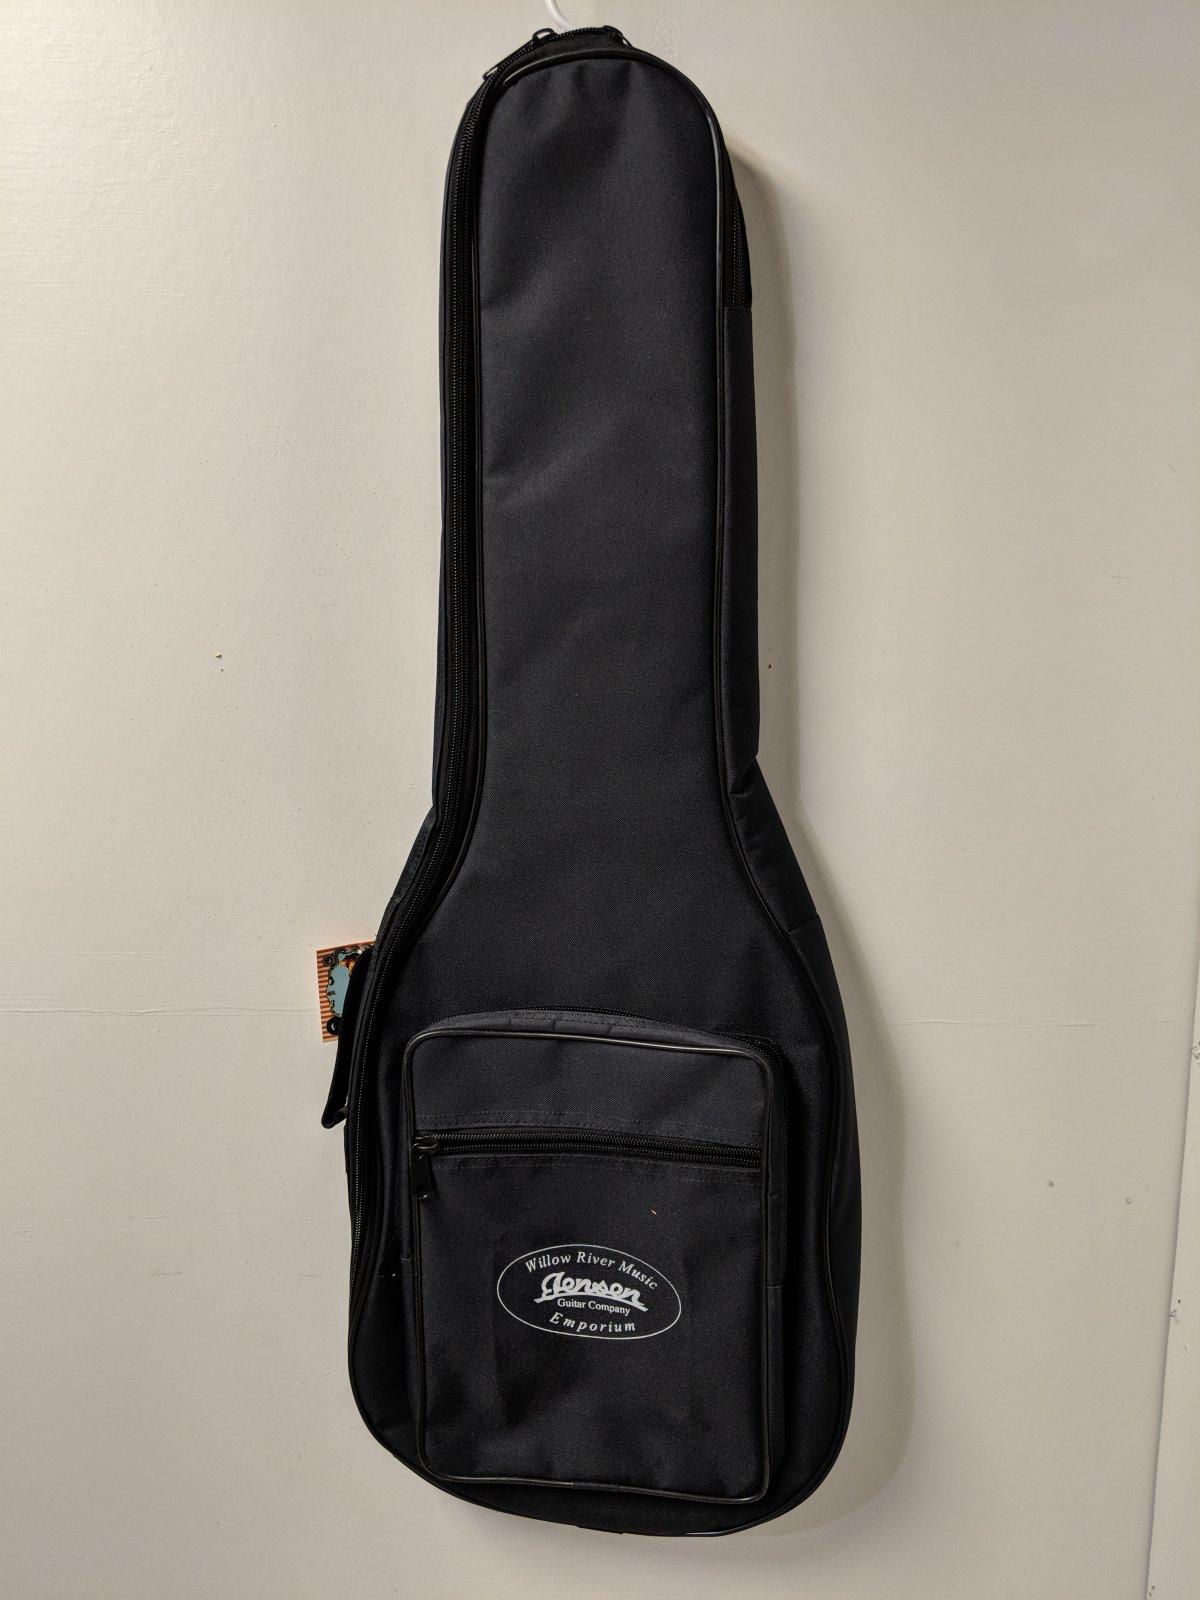 Henry Heller HGB-E1 Electric Gig Bag